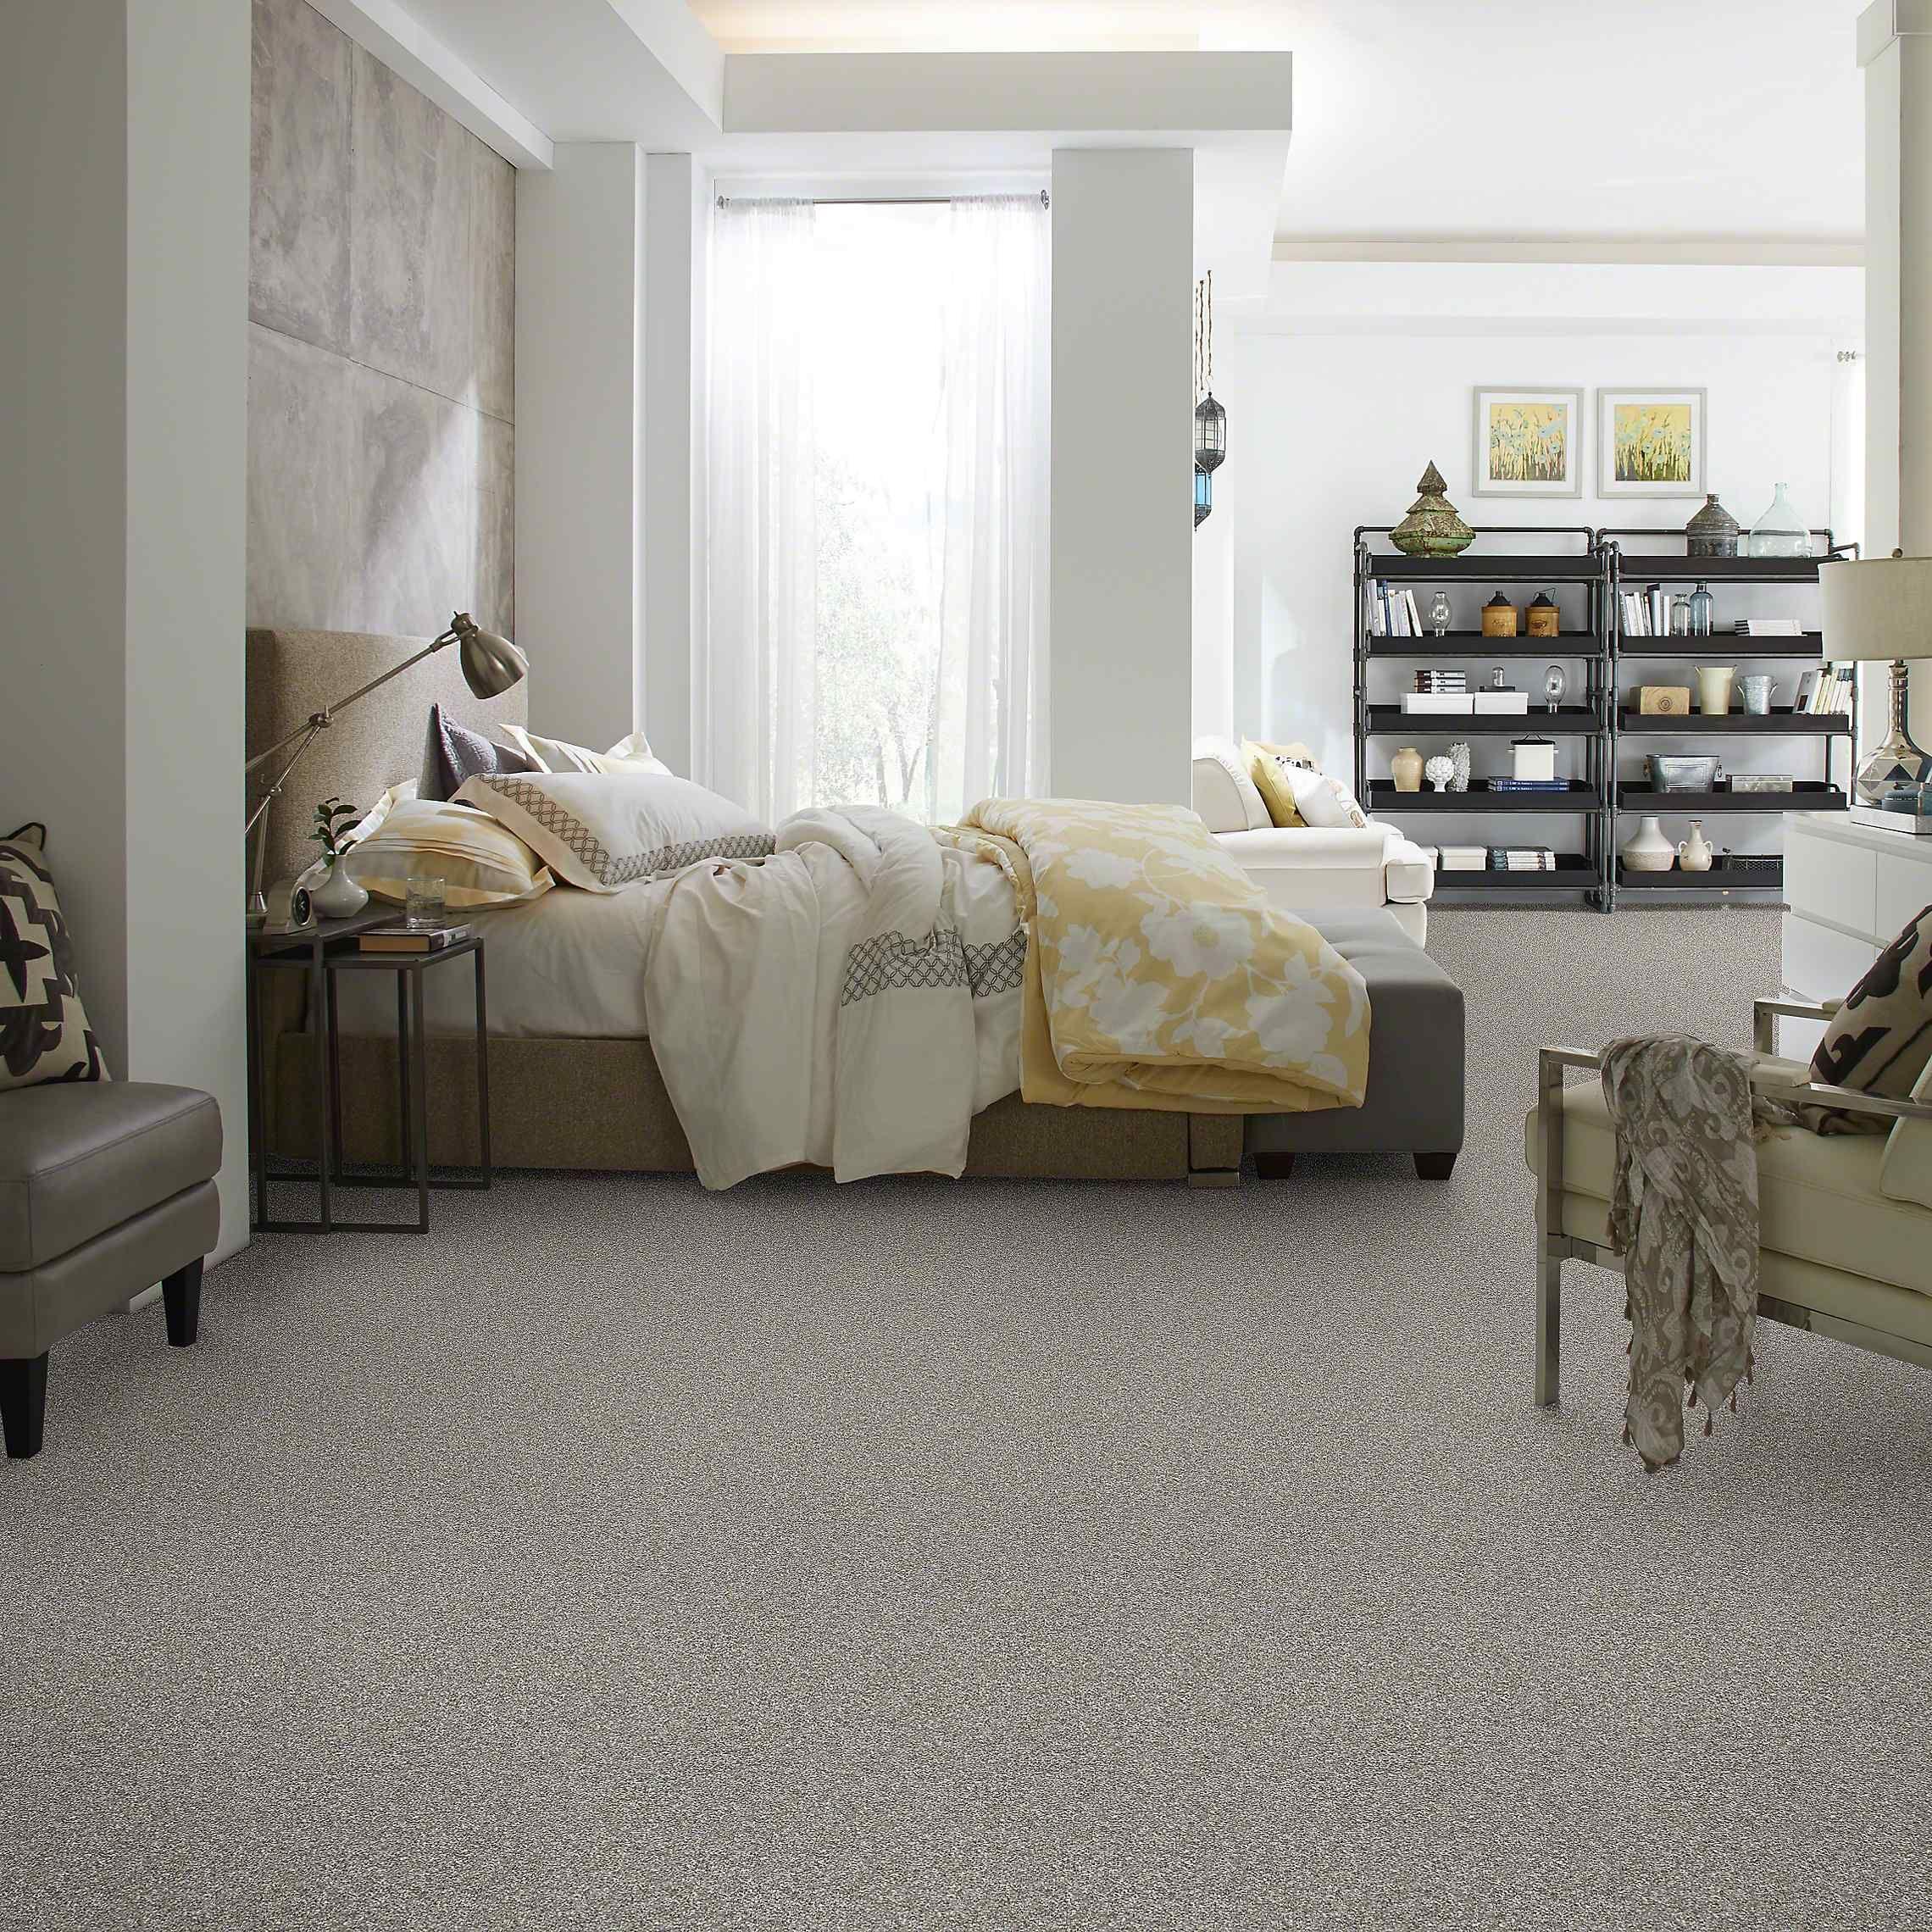 Ride It Out S E0475 Taupe Stone Carpet Carpeting Berber Texture More Carpet Colors Shaw Floors Carpet Shaw Floors